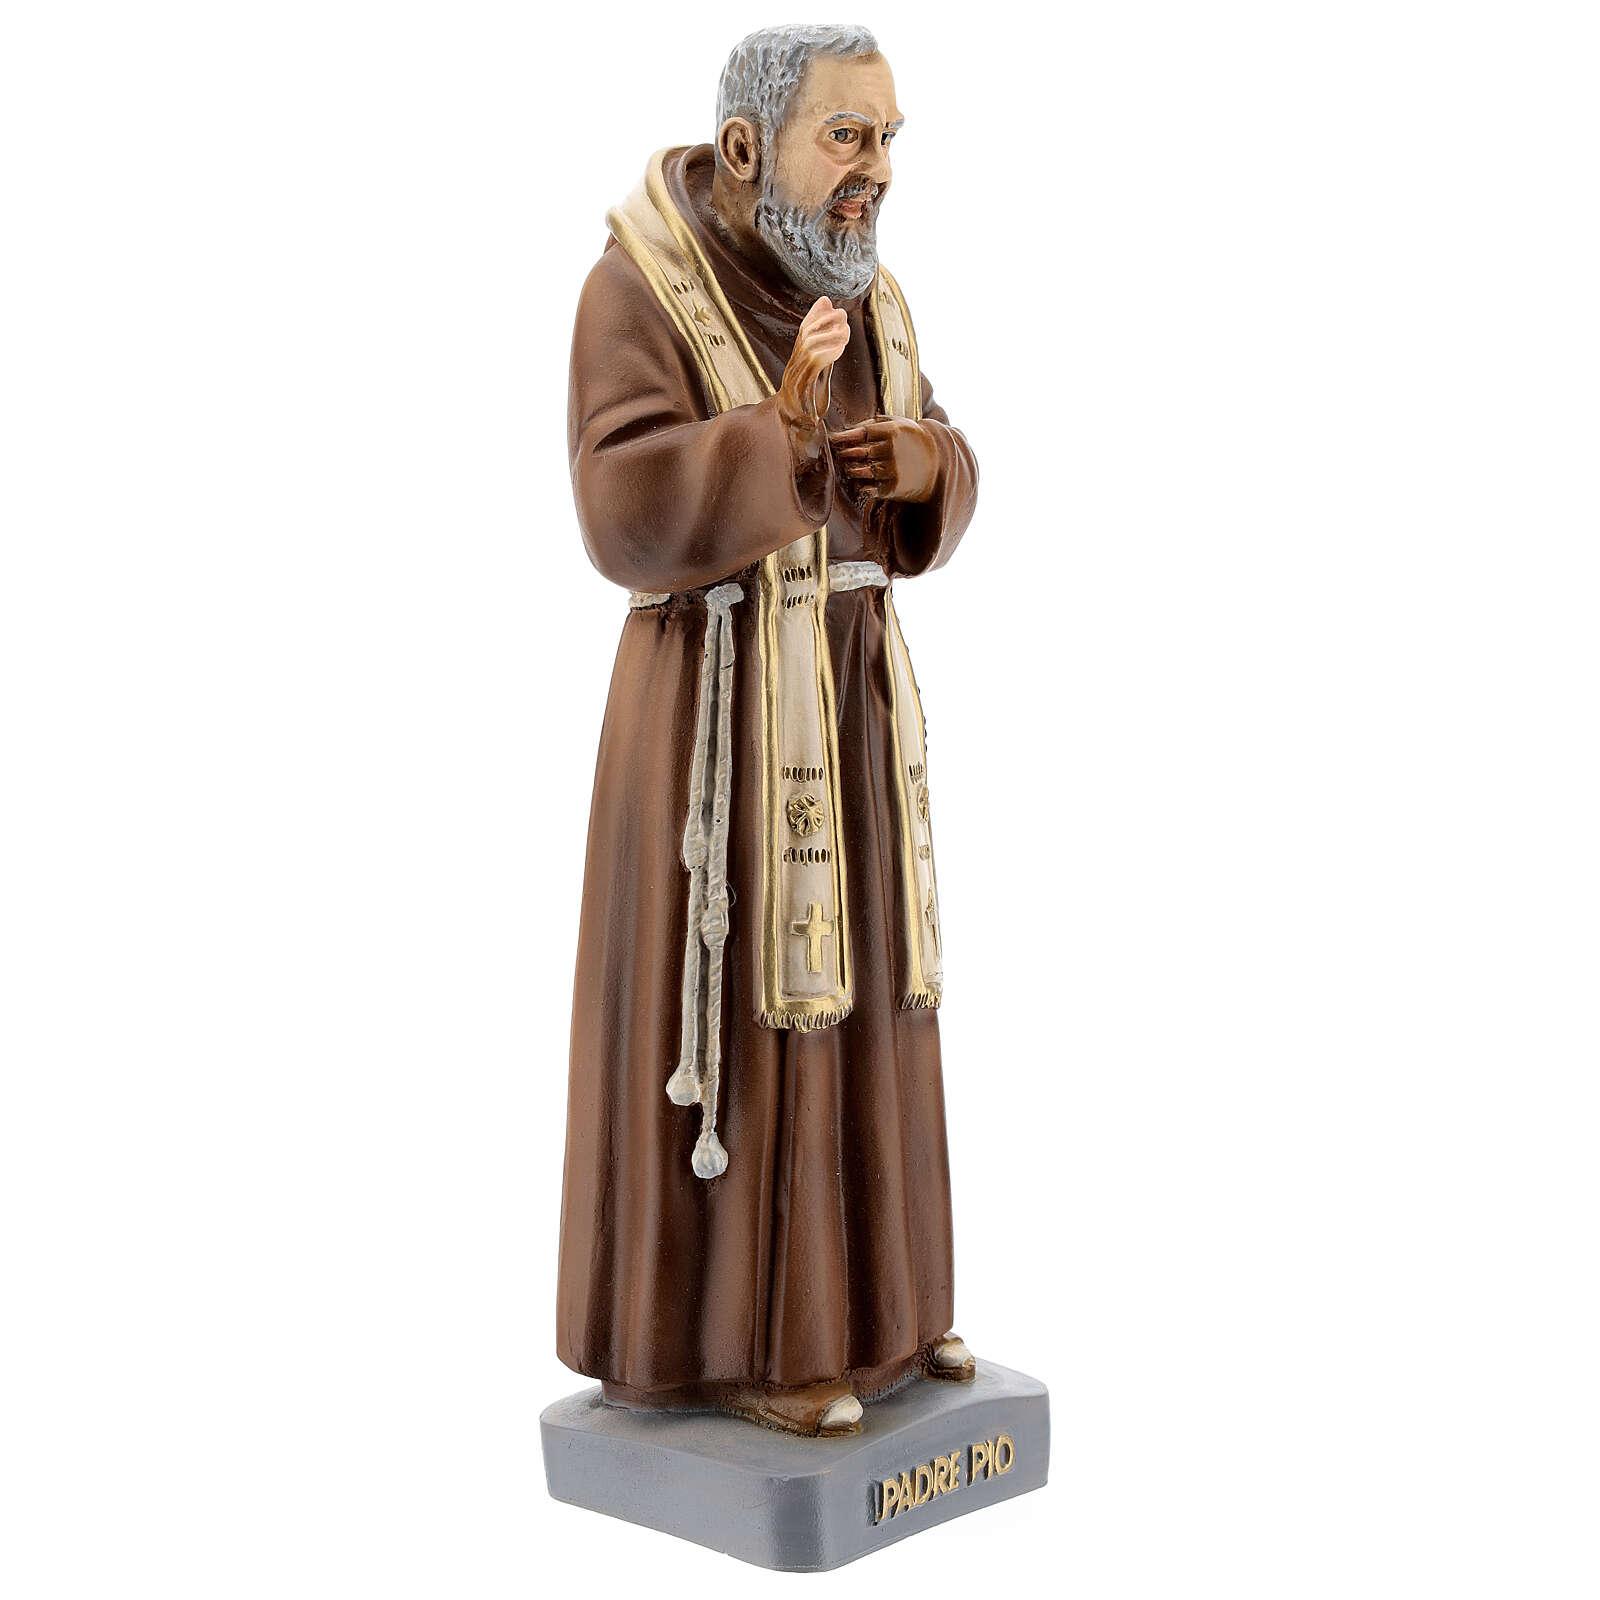 Statua San Pio con stola 26 cm resina colorata 4